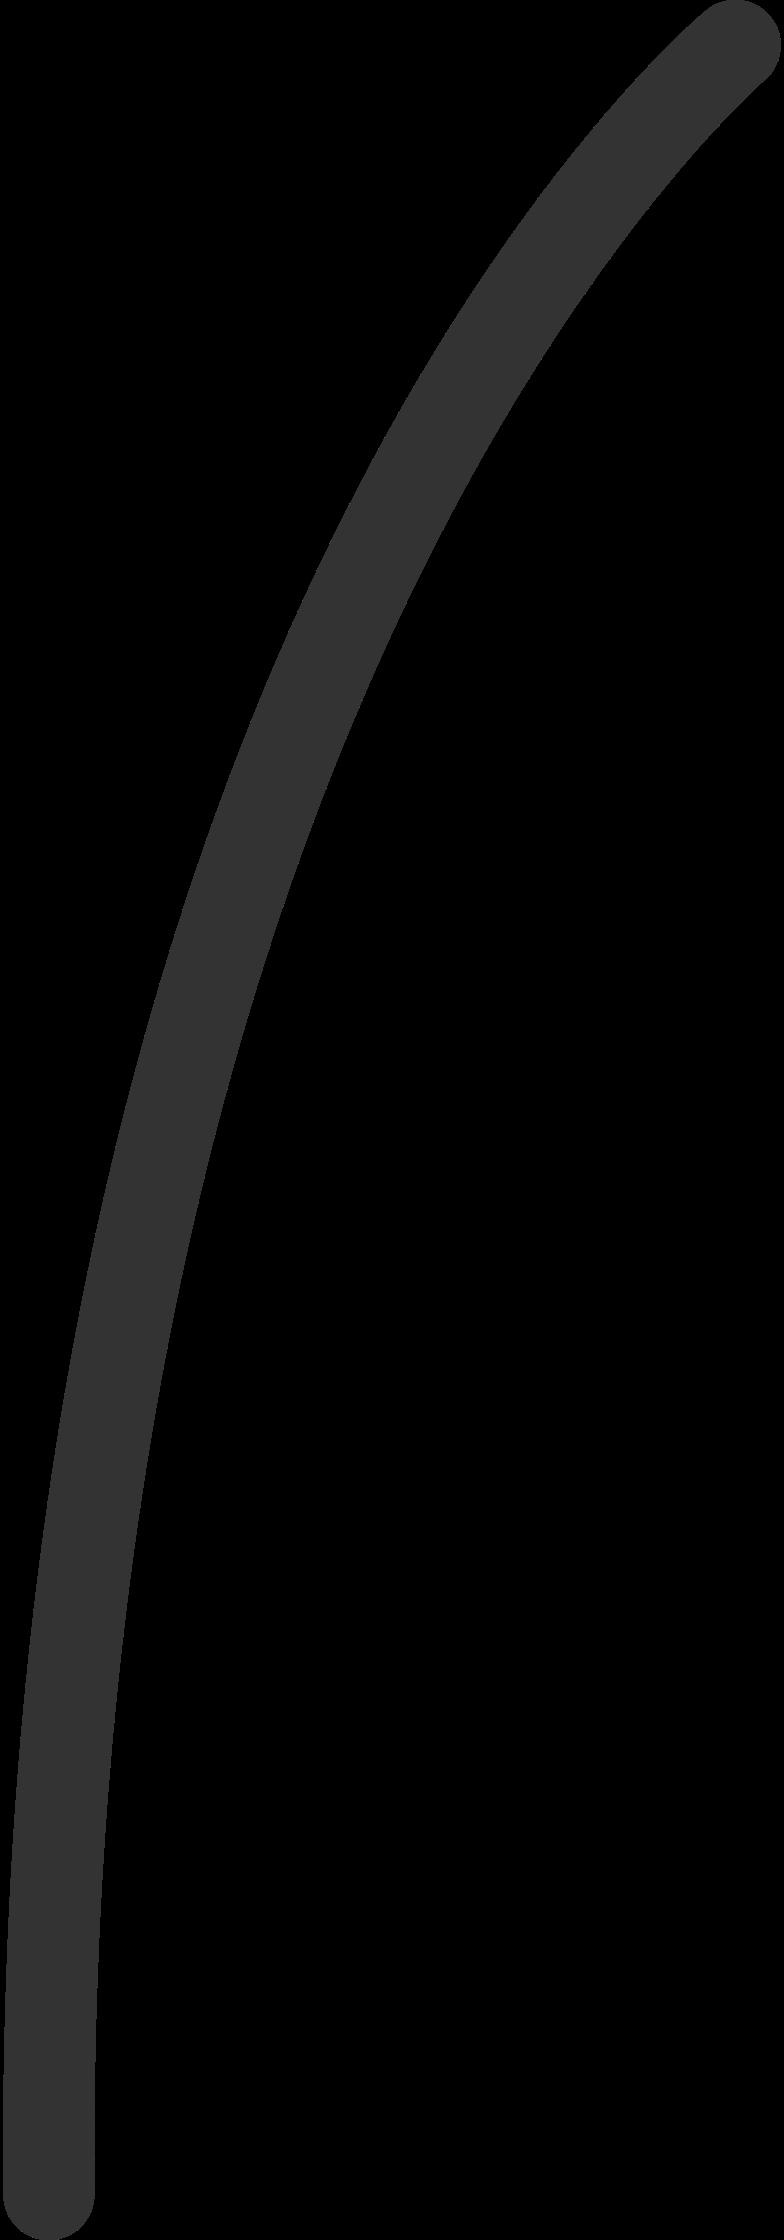 come back later line- Clipart illustration in PNG, SVG